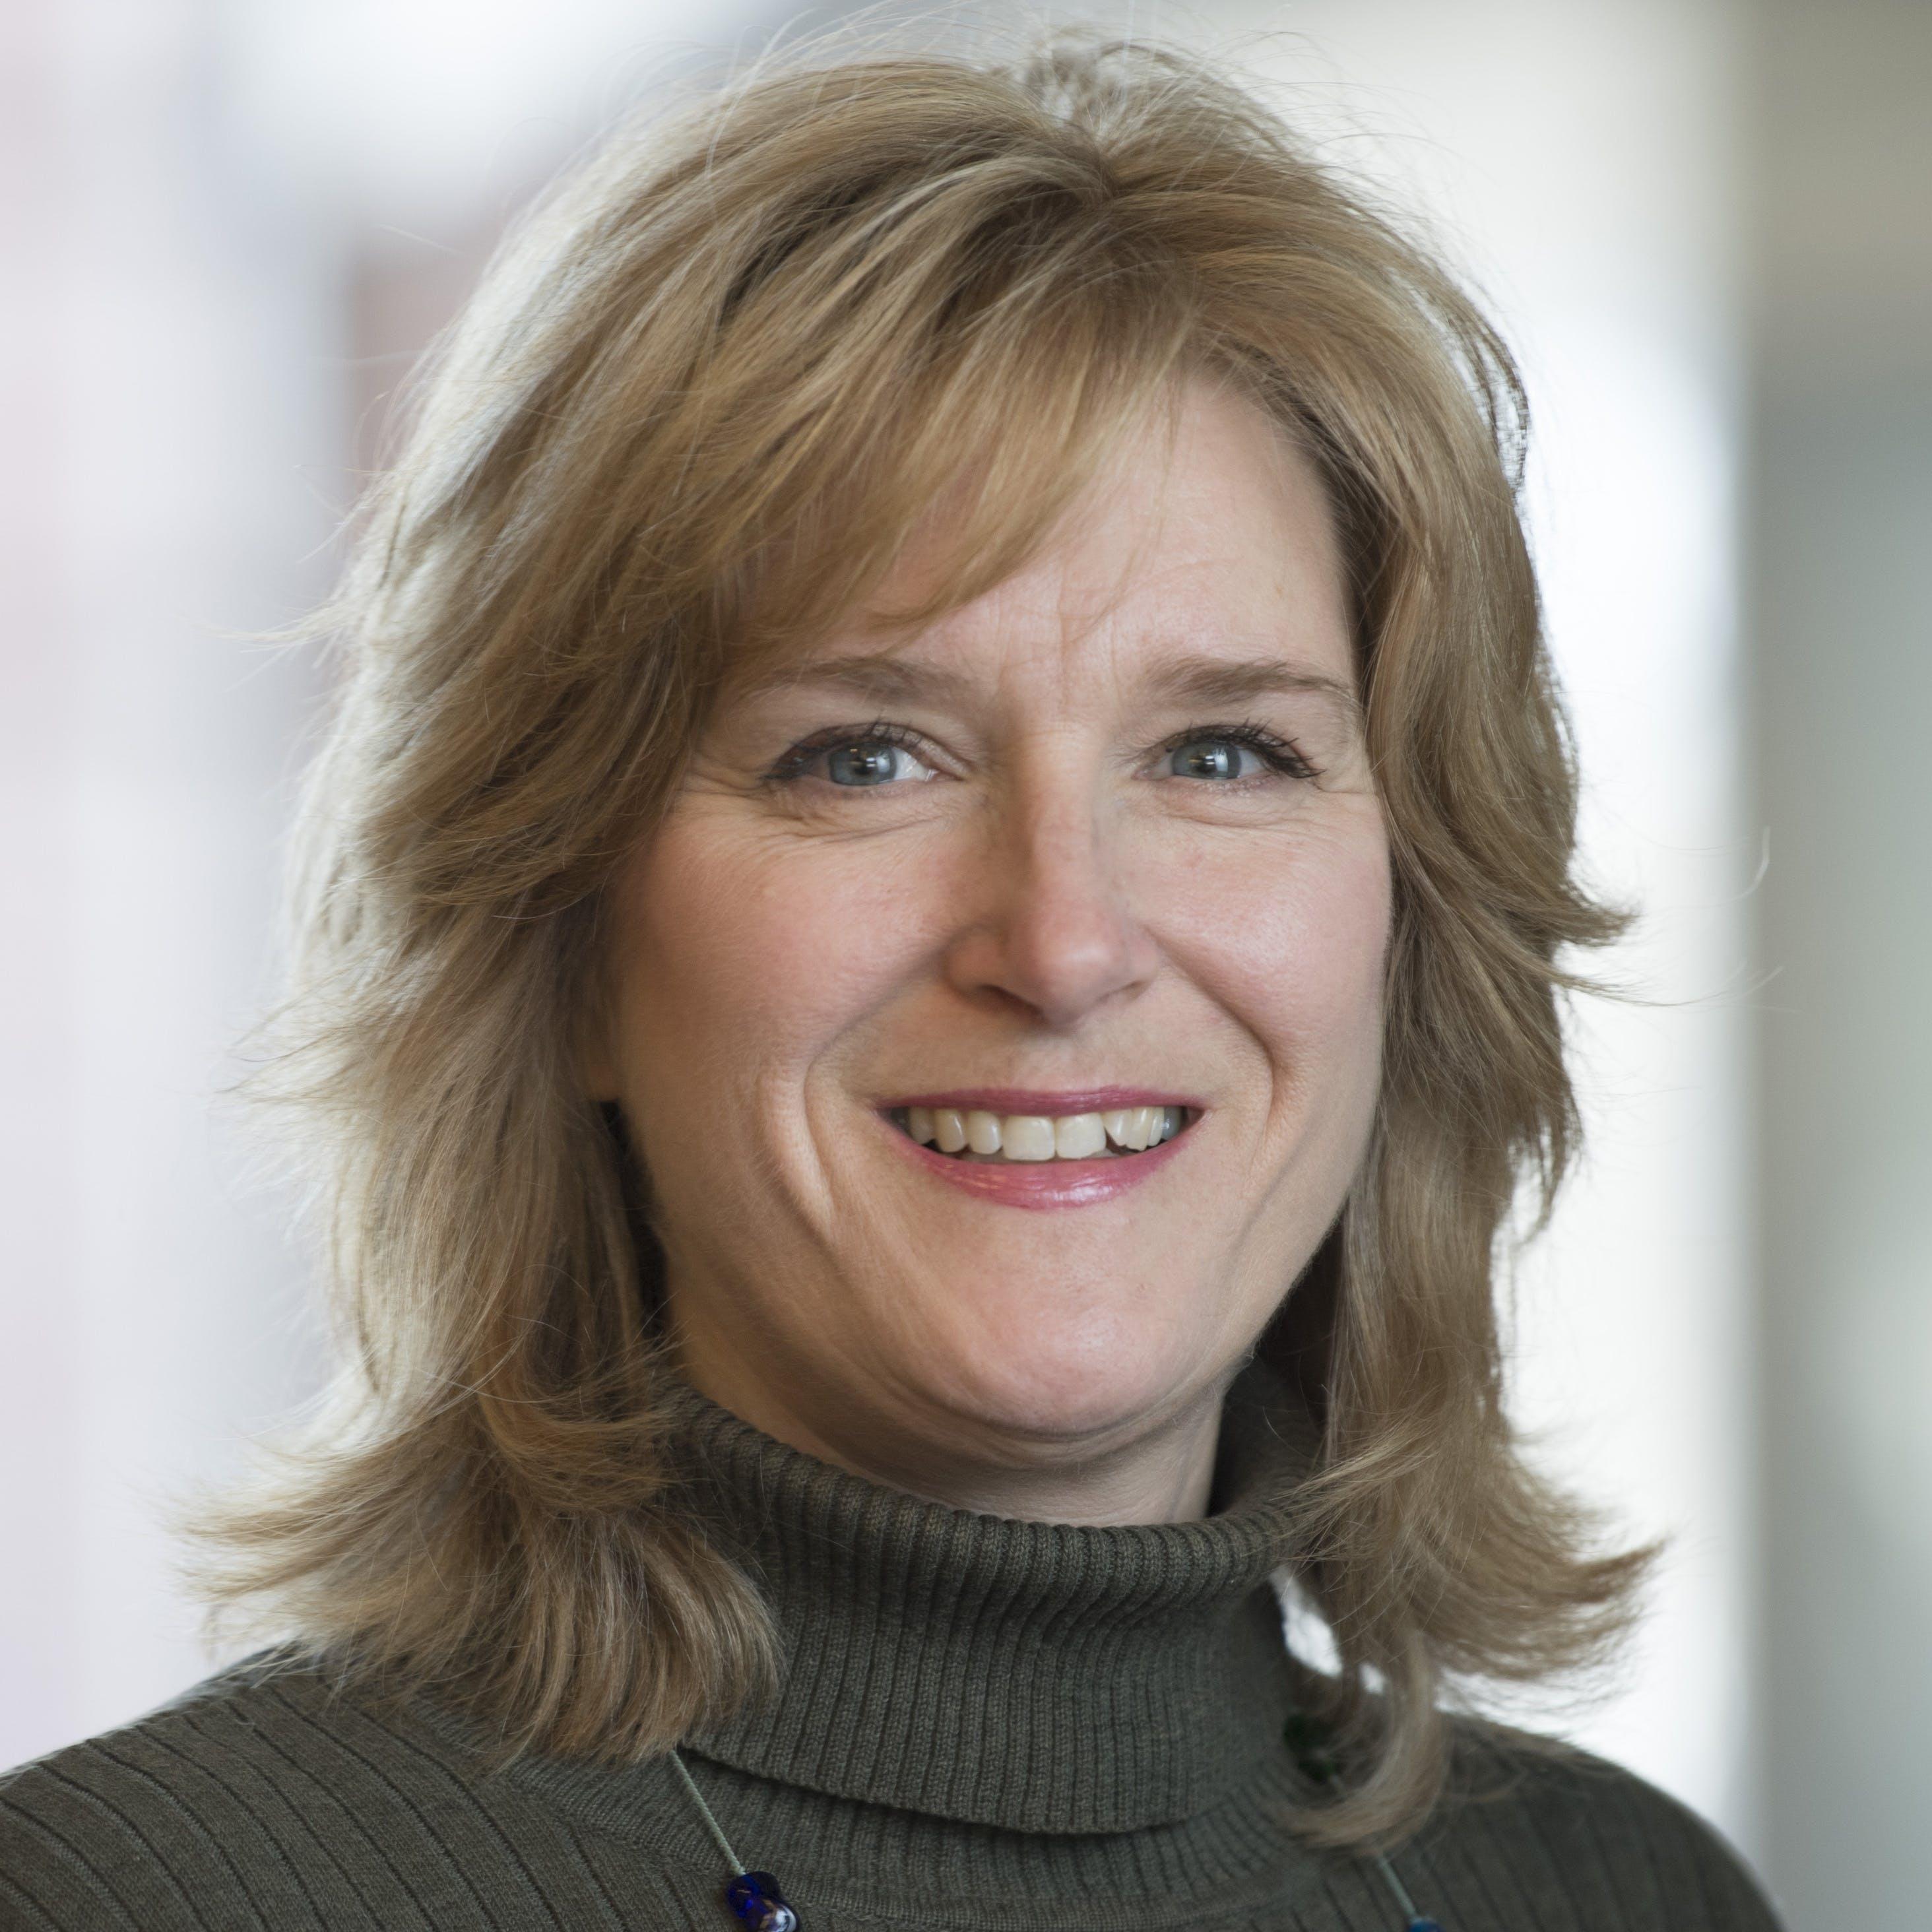 Angela Carlson-Lombardi